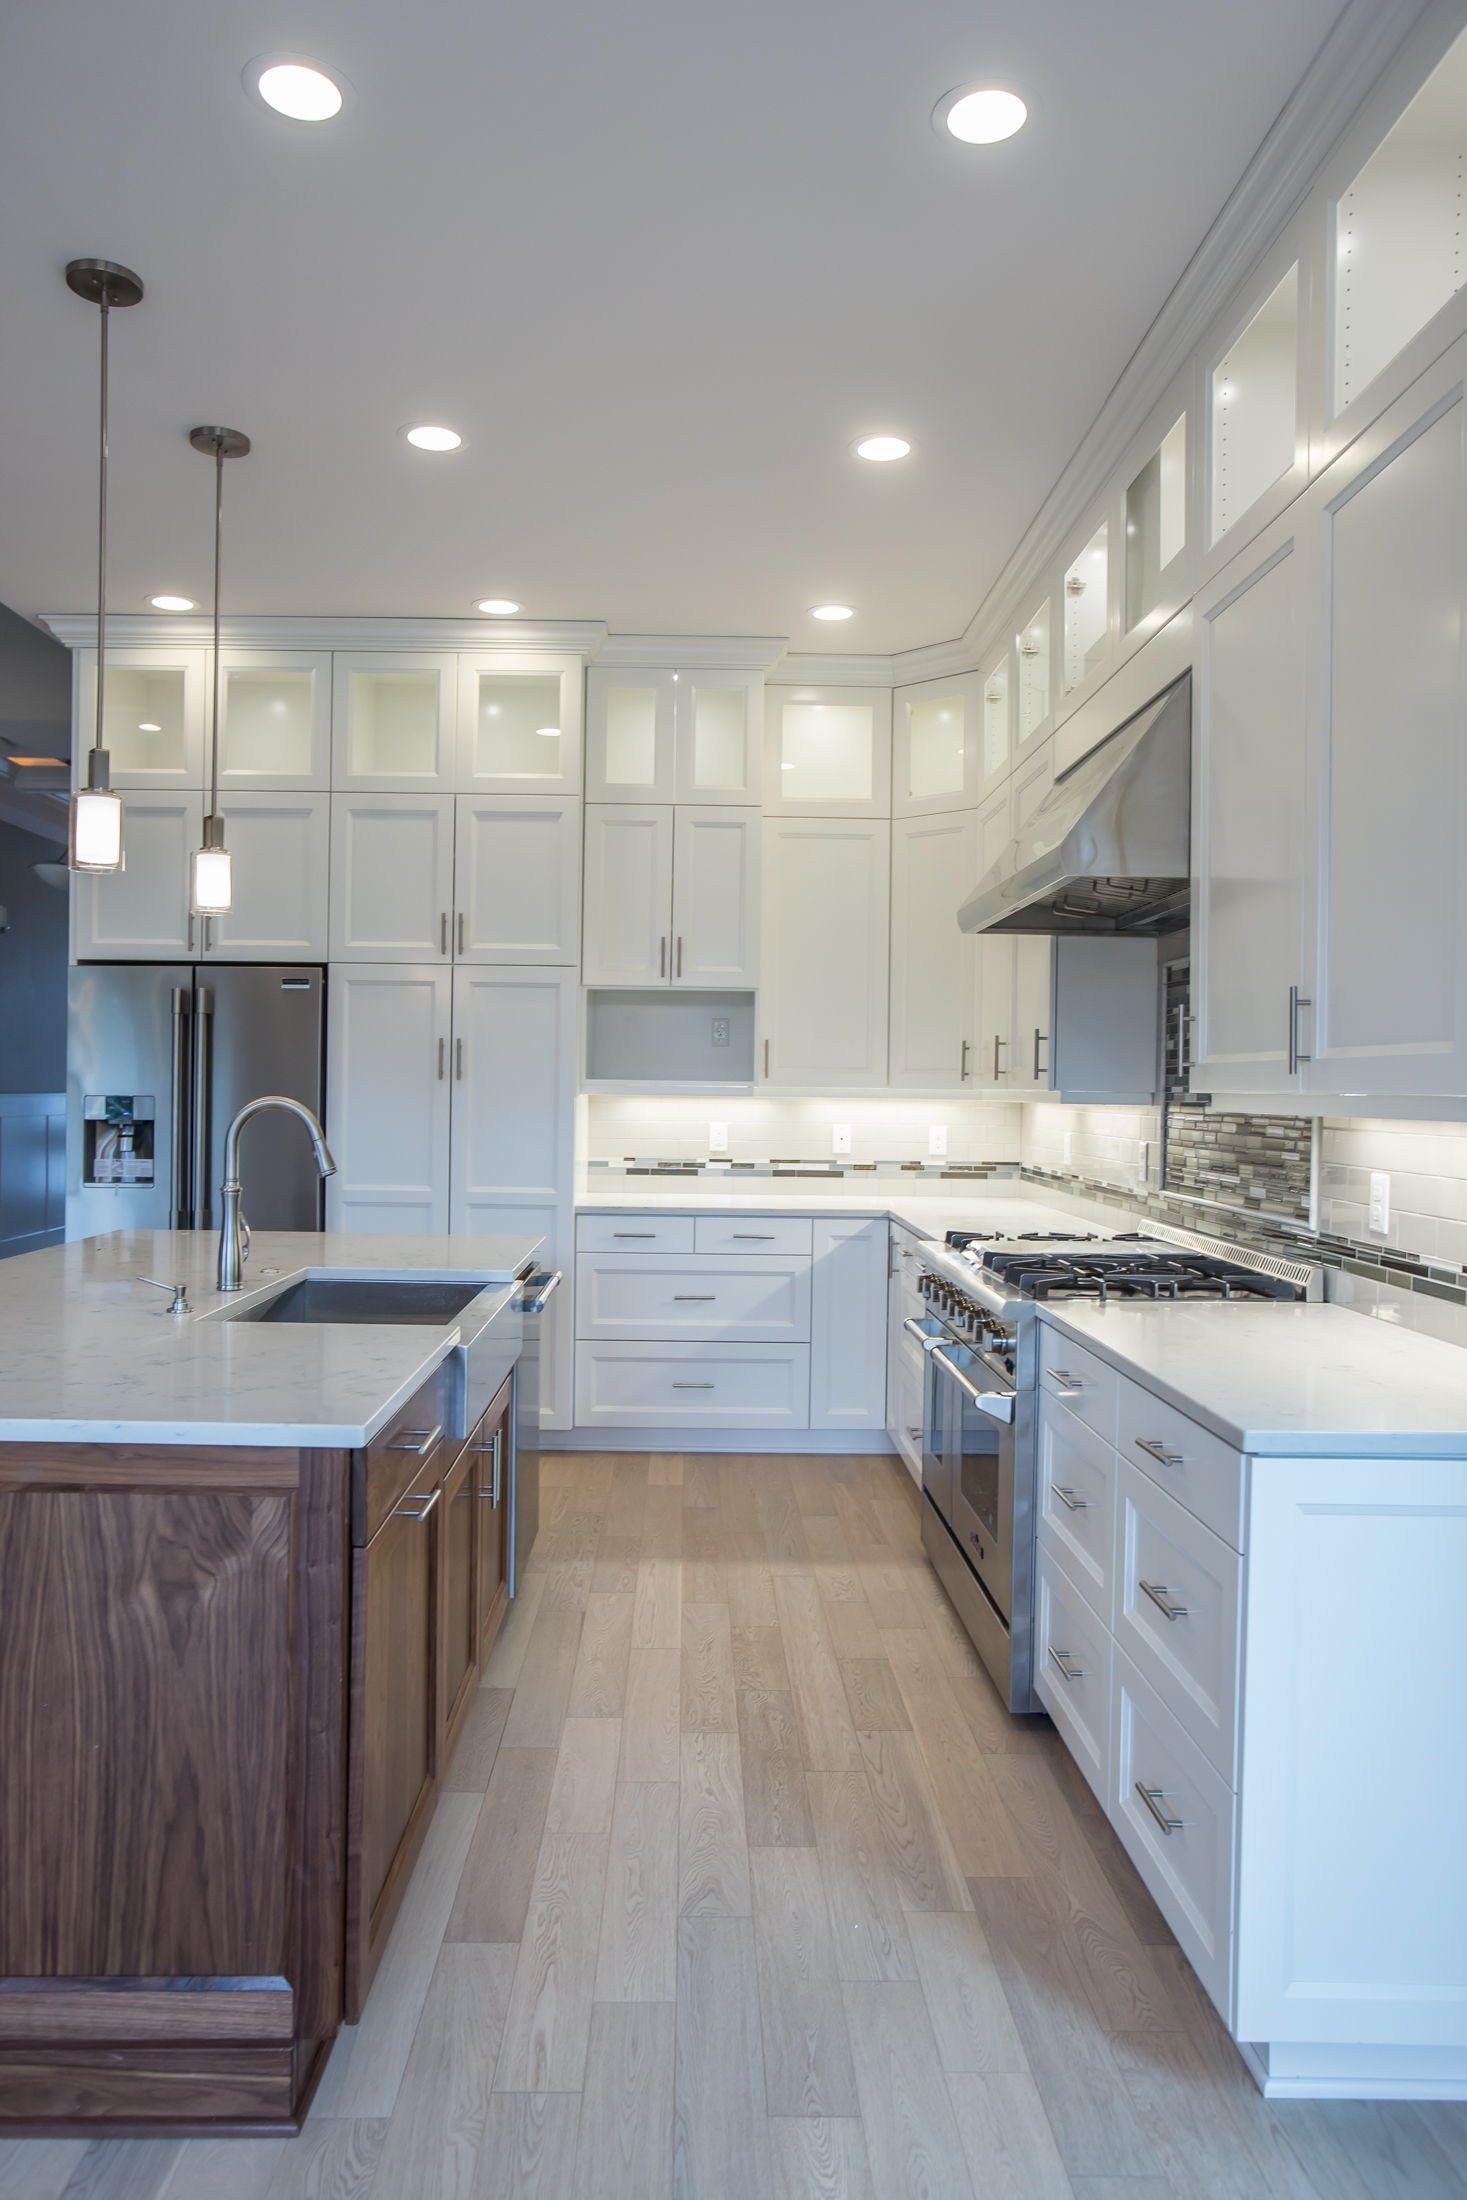 Pacific National Development Beautiful Kitchen Cabinets Kitchen Decor Kitchen Inspirations